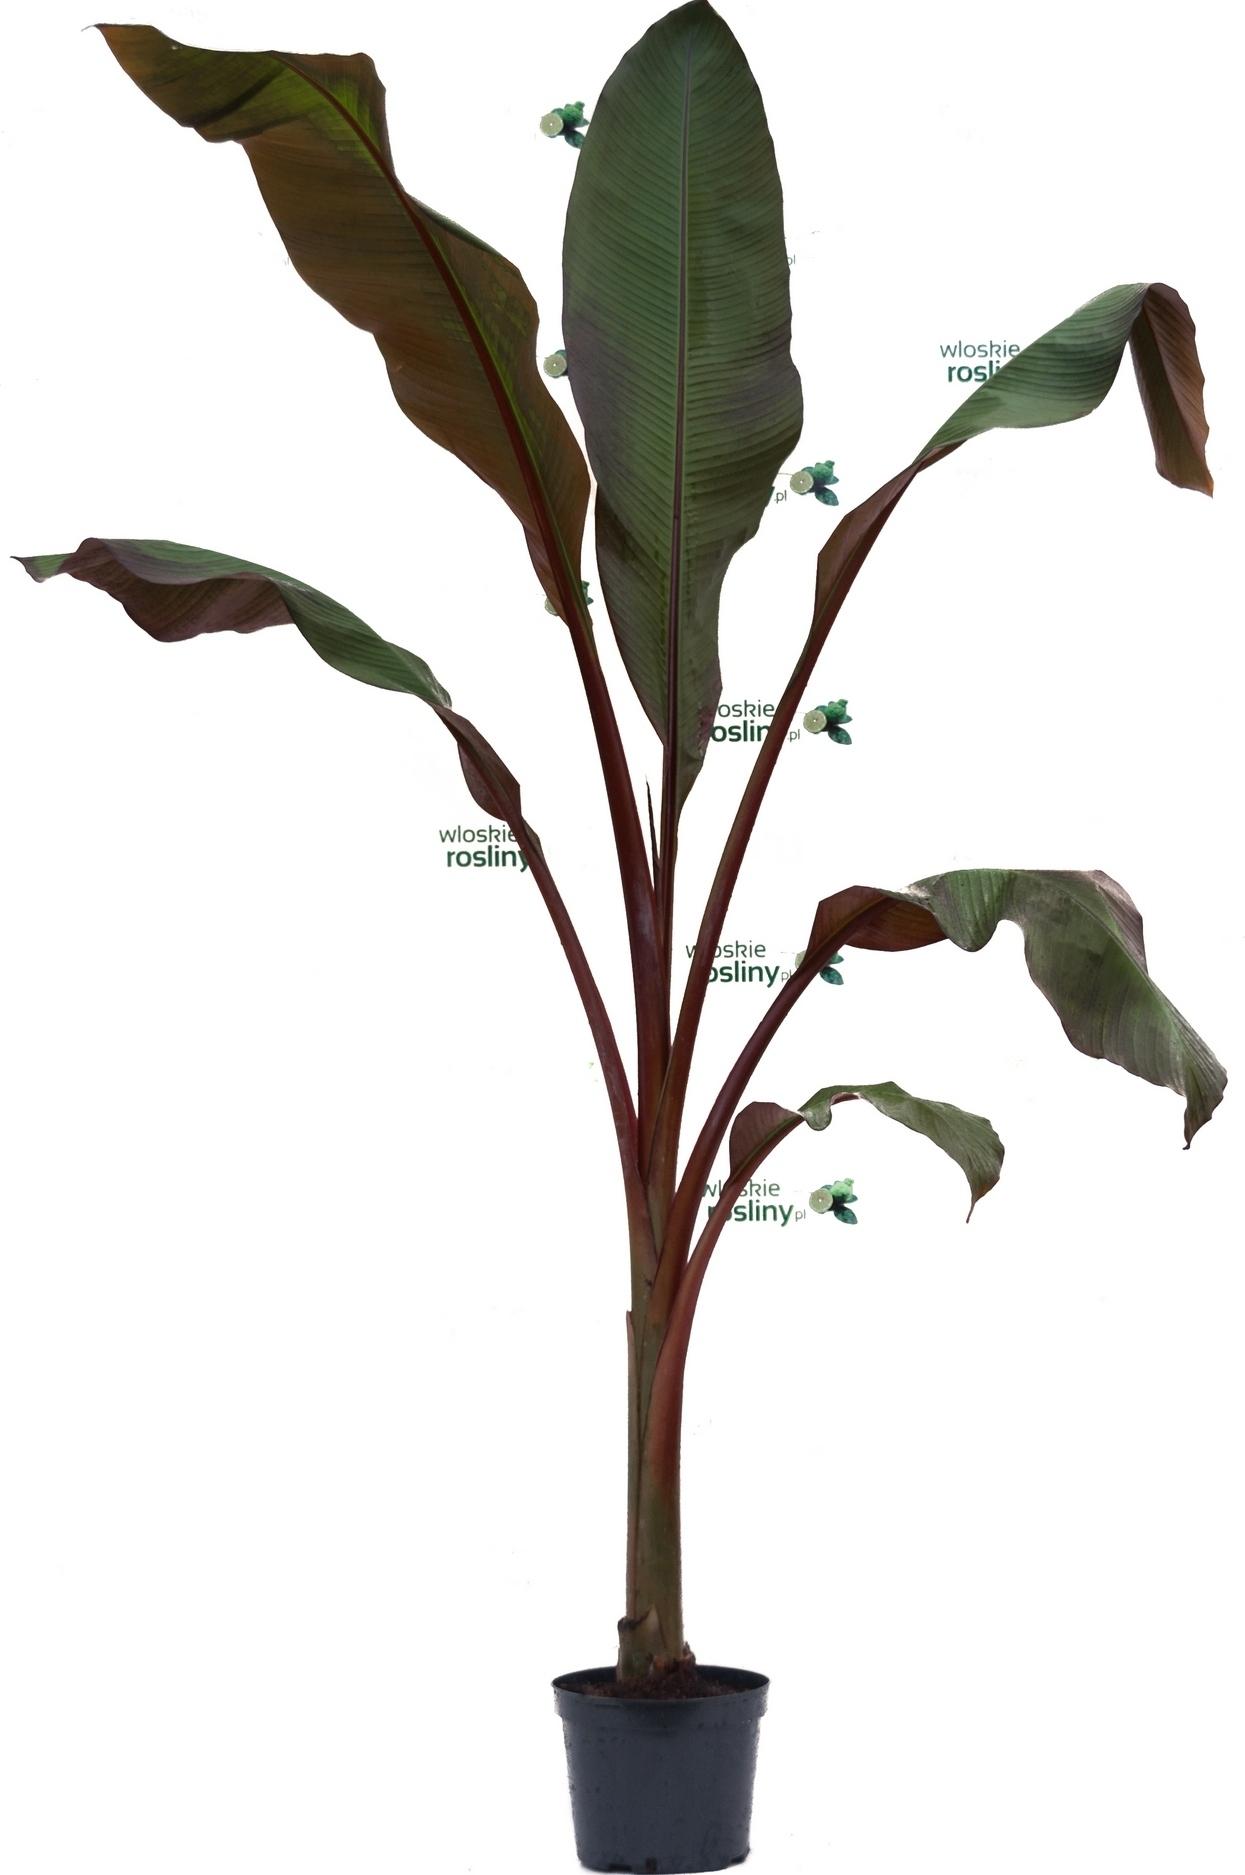 Image of Bananowiec ensete maurelii duże drzewo